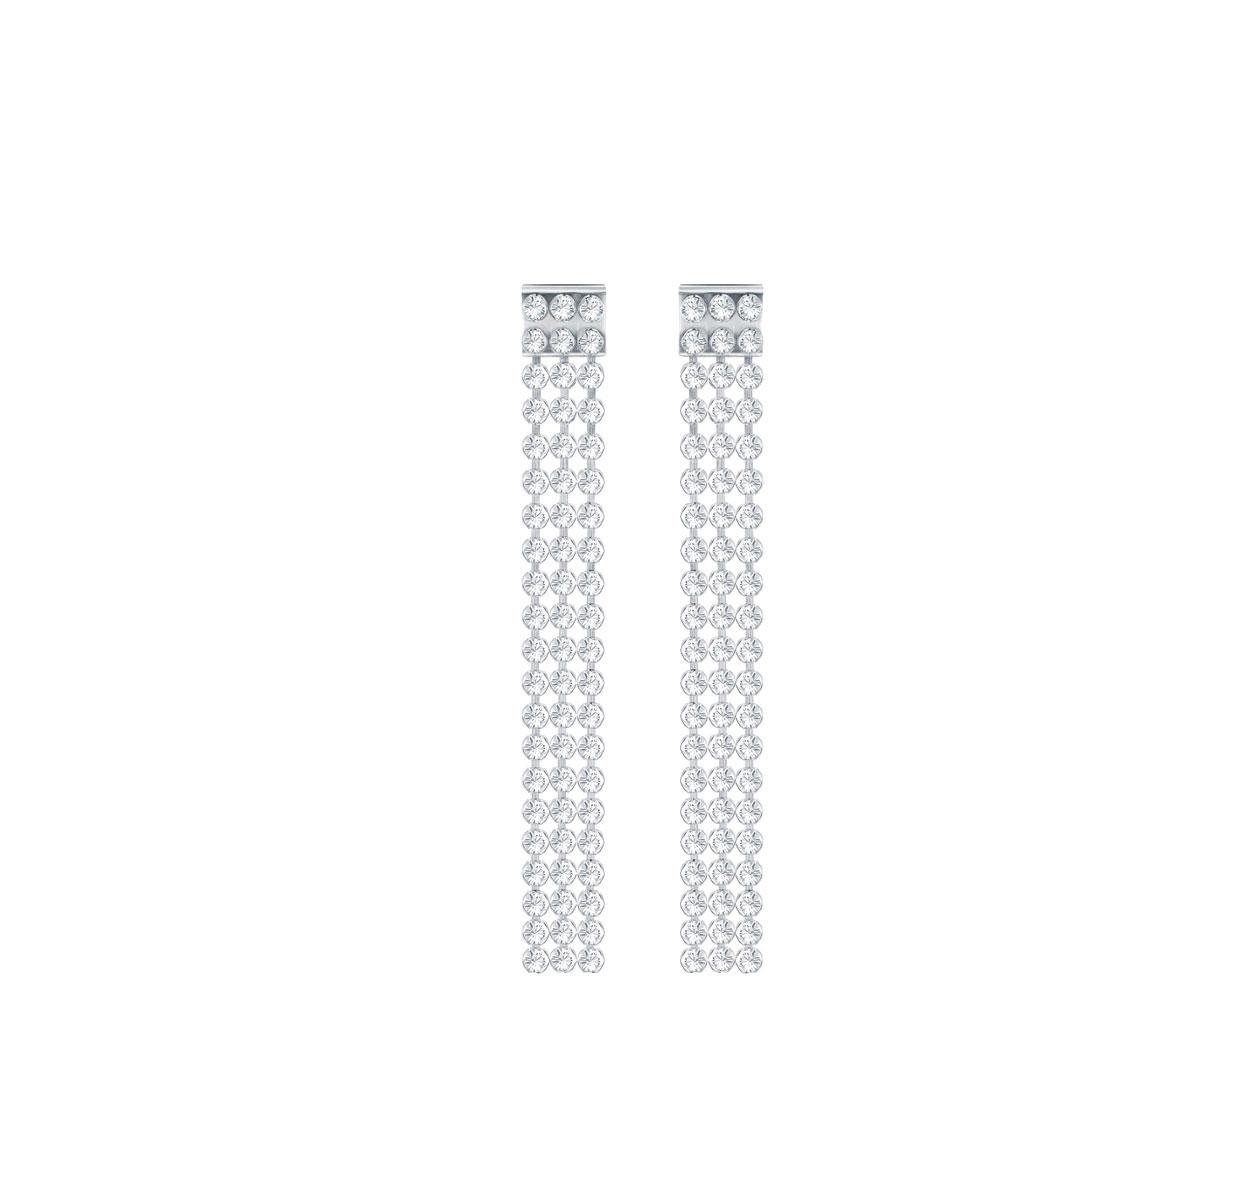 Swarovski Fit Long Pierced Earrings, White, Palladium Plating